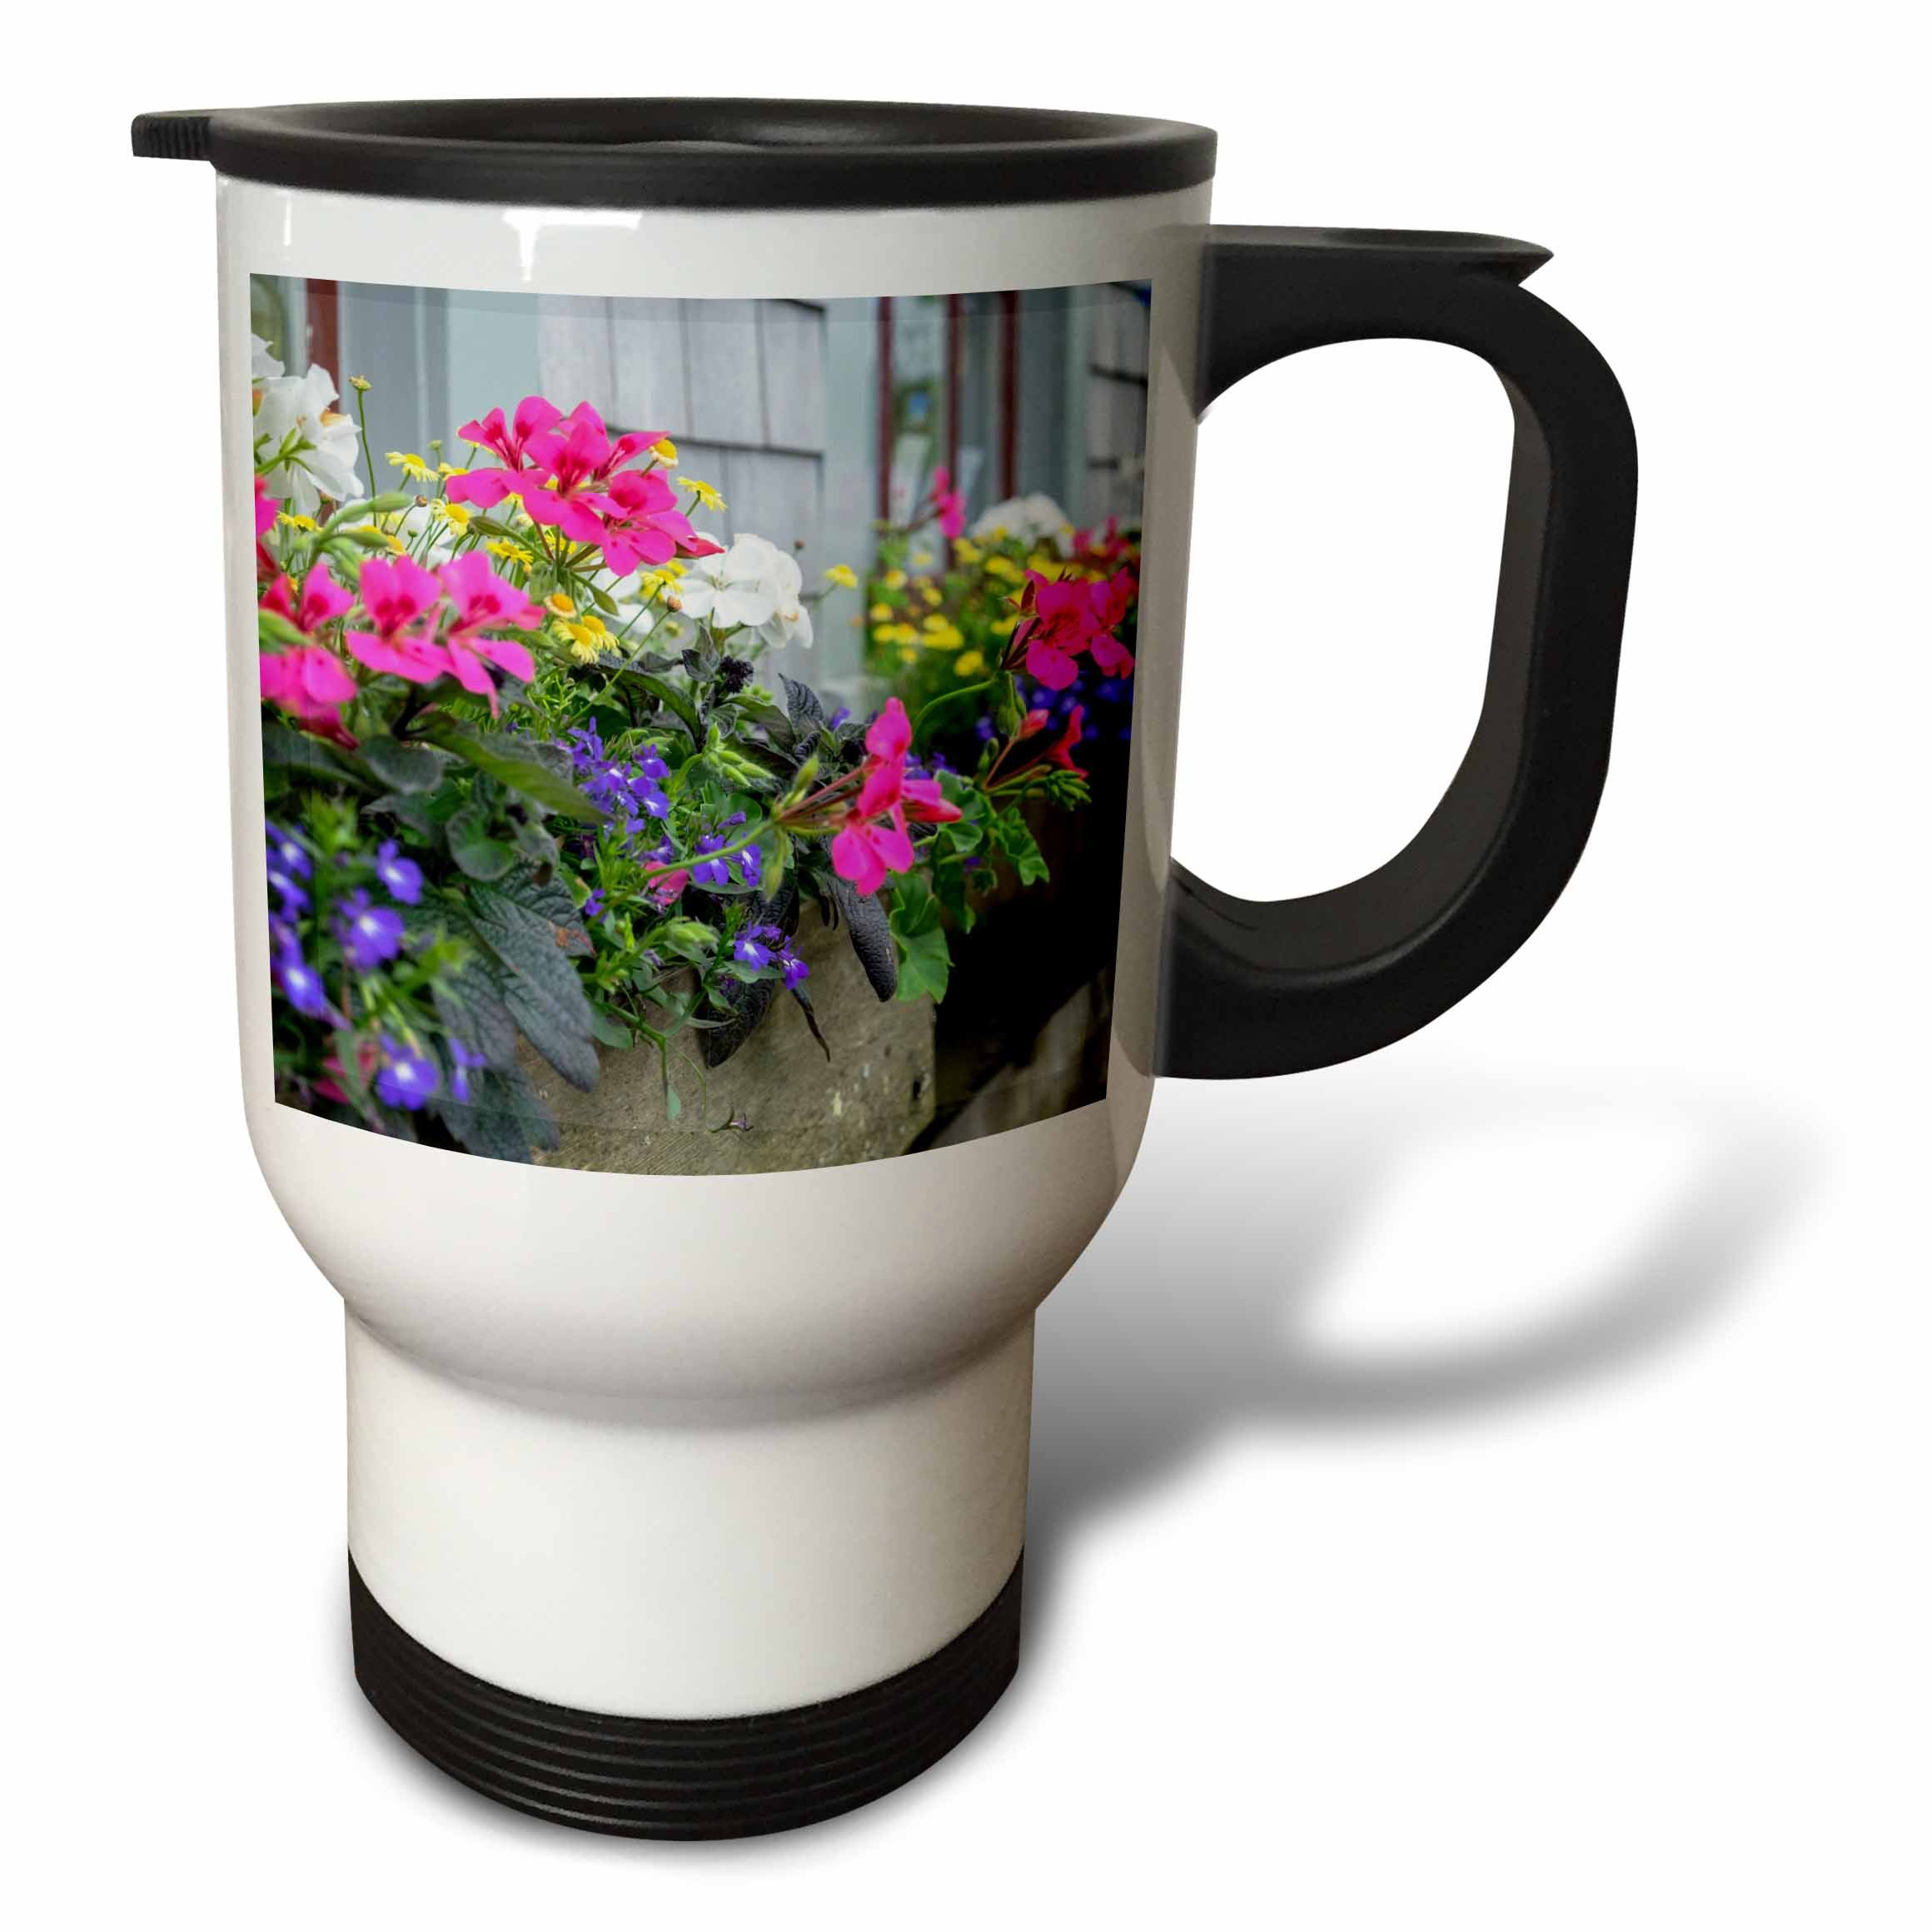 3dRose Danita Delimont - Flowers - Flowers in window boxes, Nantucket, Massachusetts, USA - 14oz Stainless Steel Travel Mug (tm_279042_1) by 3dRose (Image #1)